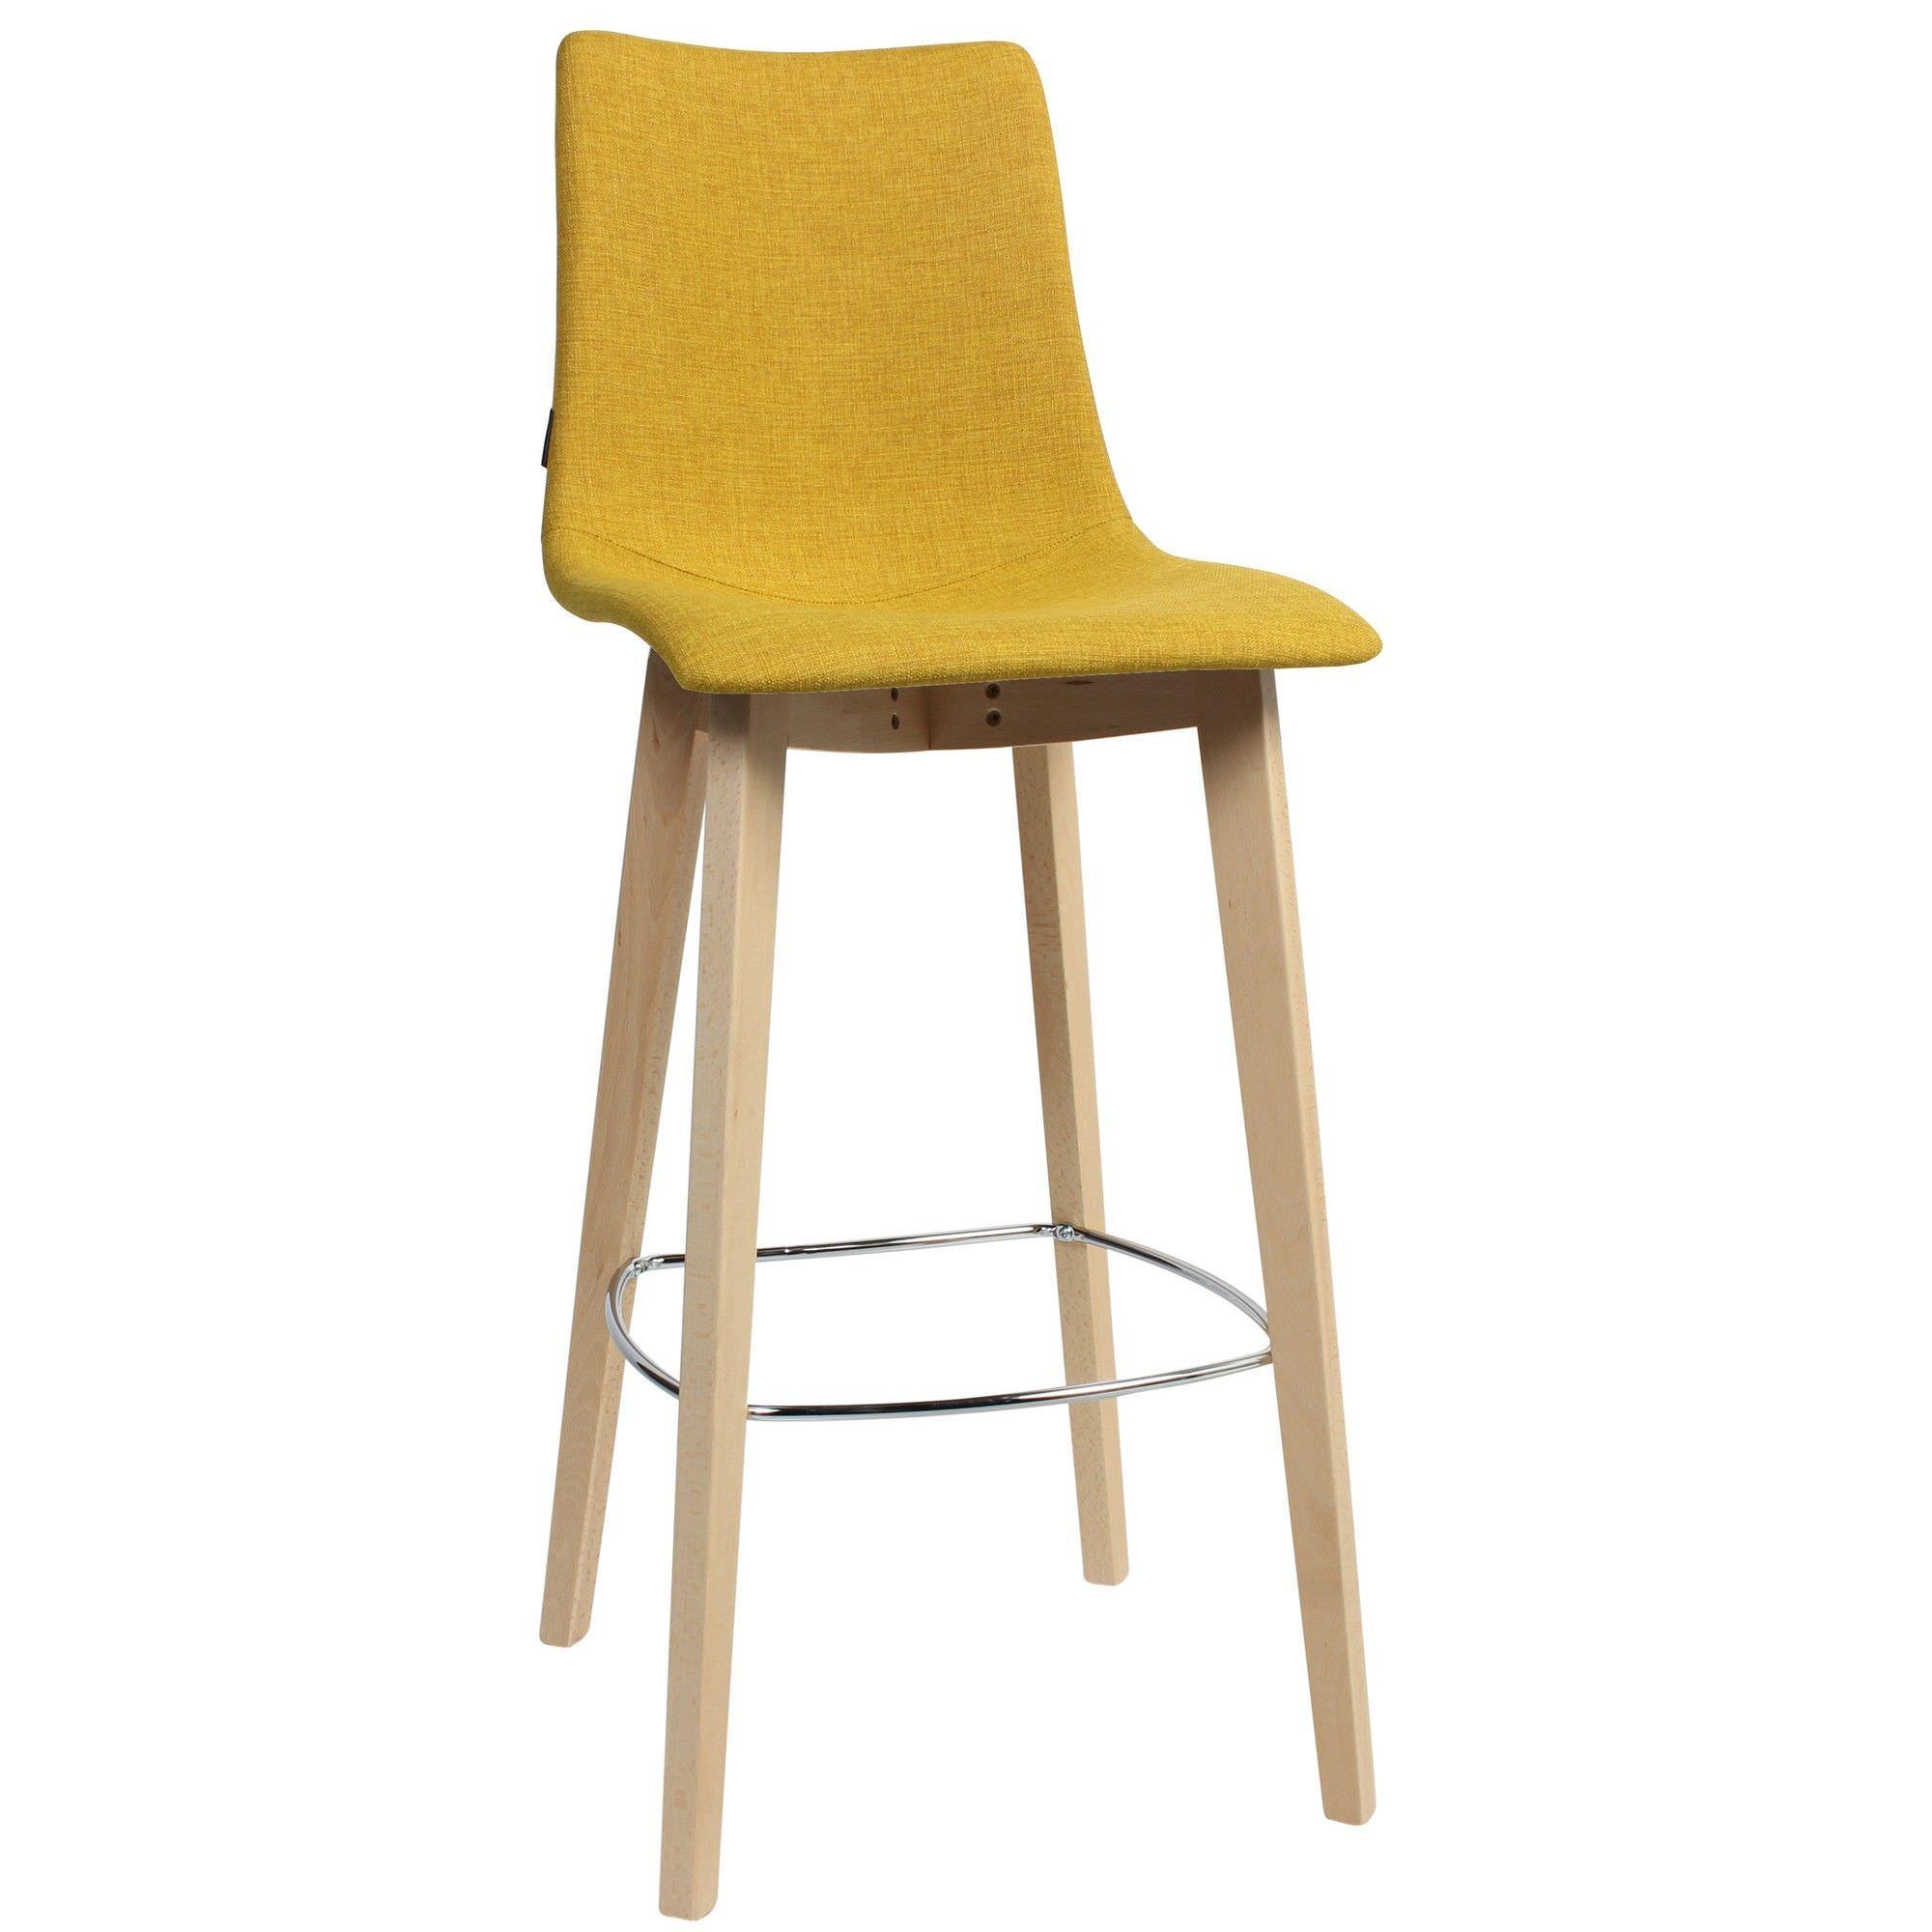 Zebra Pop Italian Made Commercial Grade Fabric Bar Stool, Timber Leg, Saffron / Natural